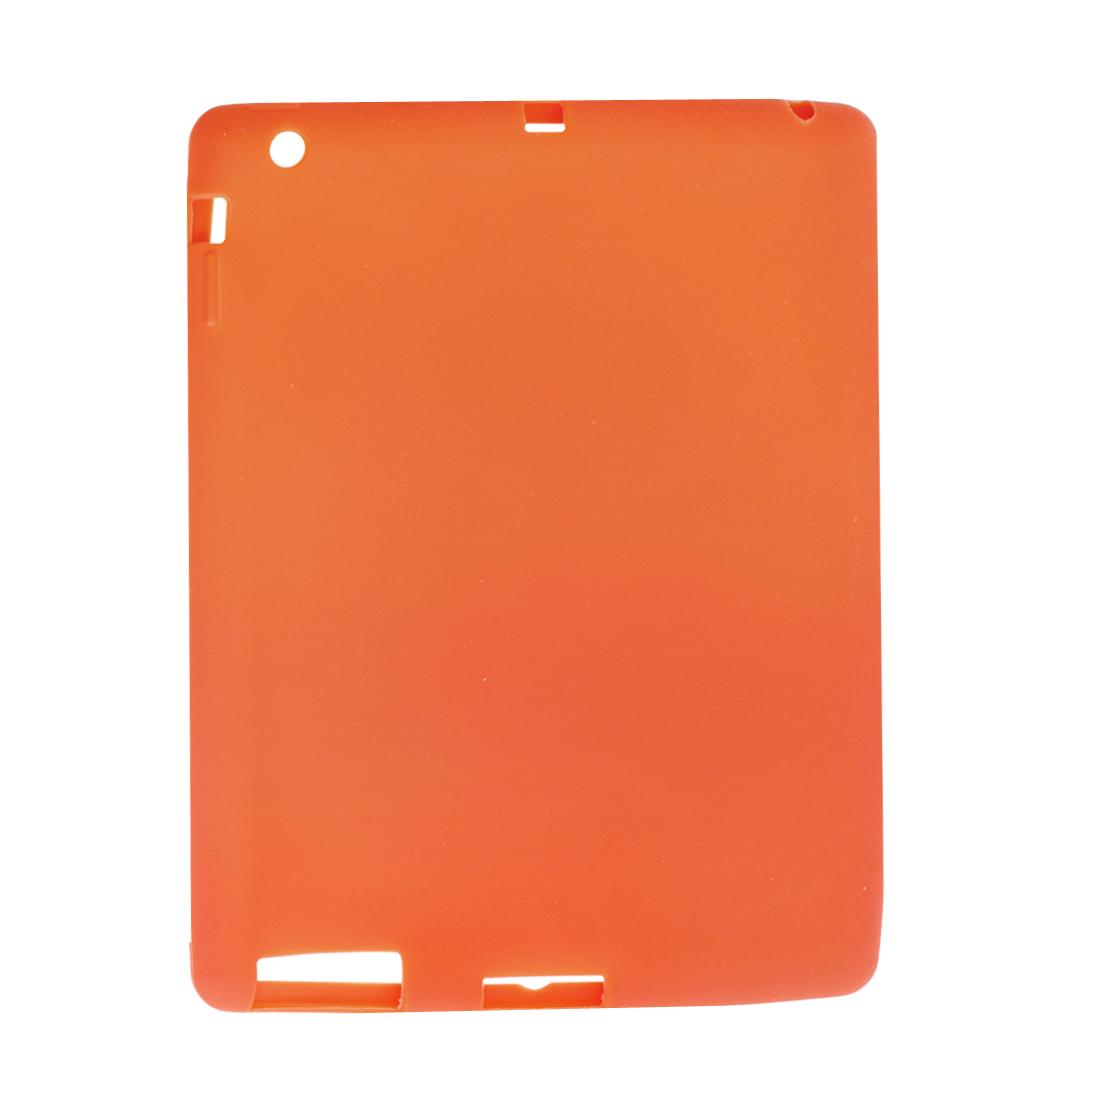 Orange Non-Slip Cover Case Silionce Skin for Apple iPad 2 3 4